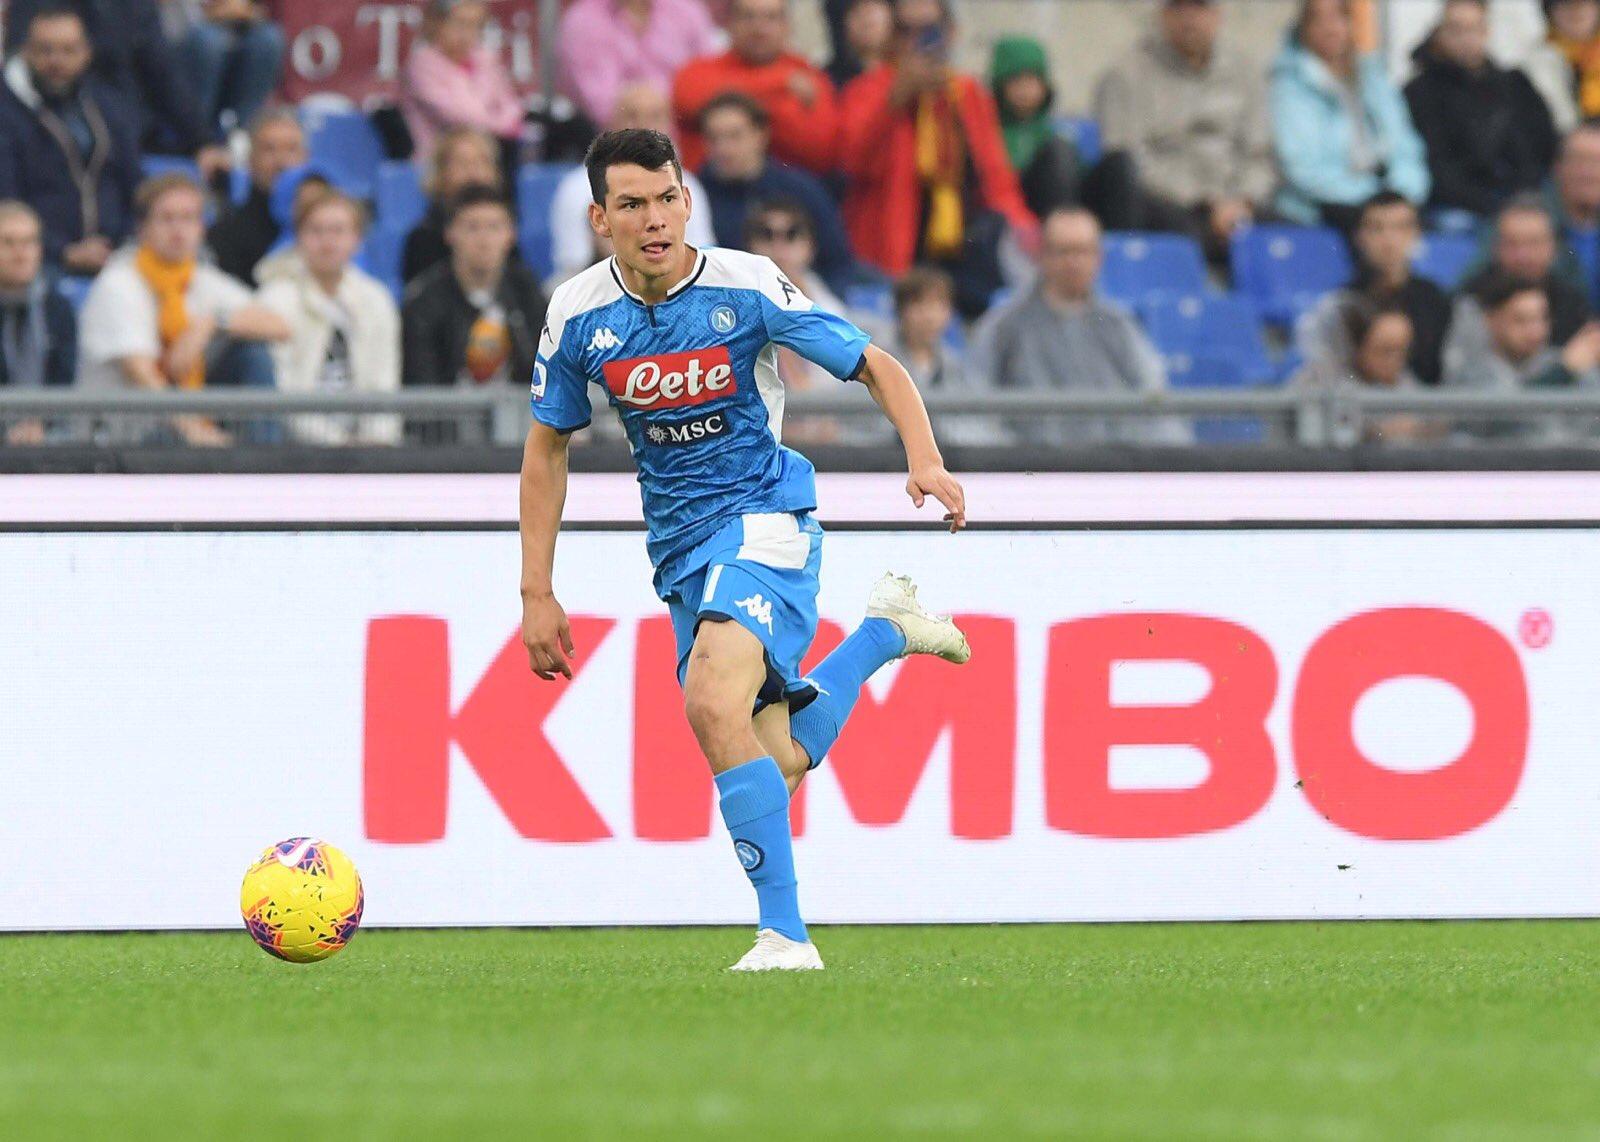 CorSport: Napoli-Genoa, sorpresa Hysaj. Ospina dal primo minuto. Dubbio su Milik